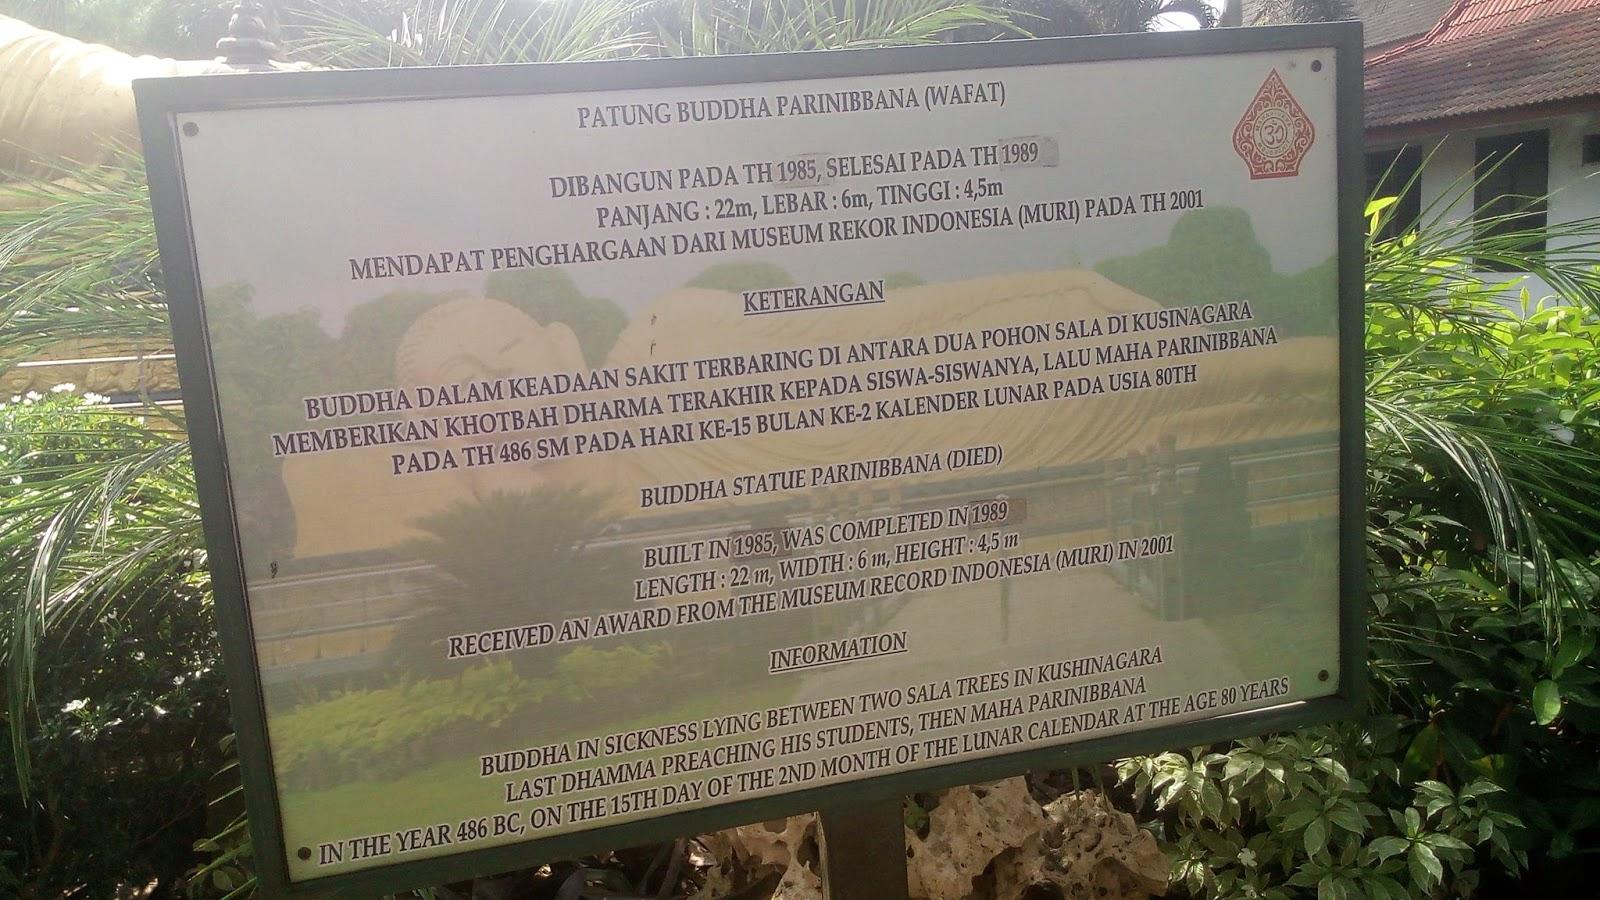 Berkunjung Maha Vihara Mojokerto Indonesia Punya Patung Terletak Mojopahit Desa